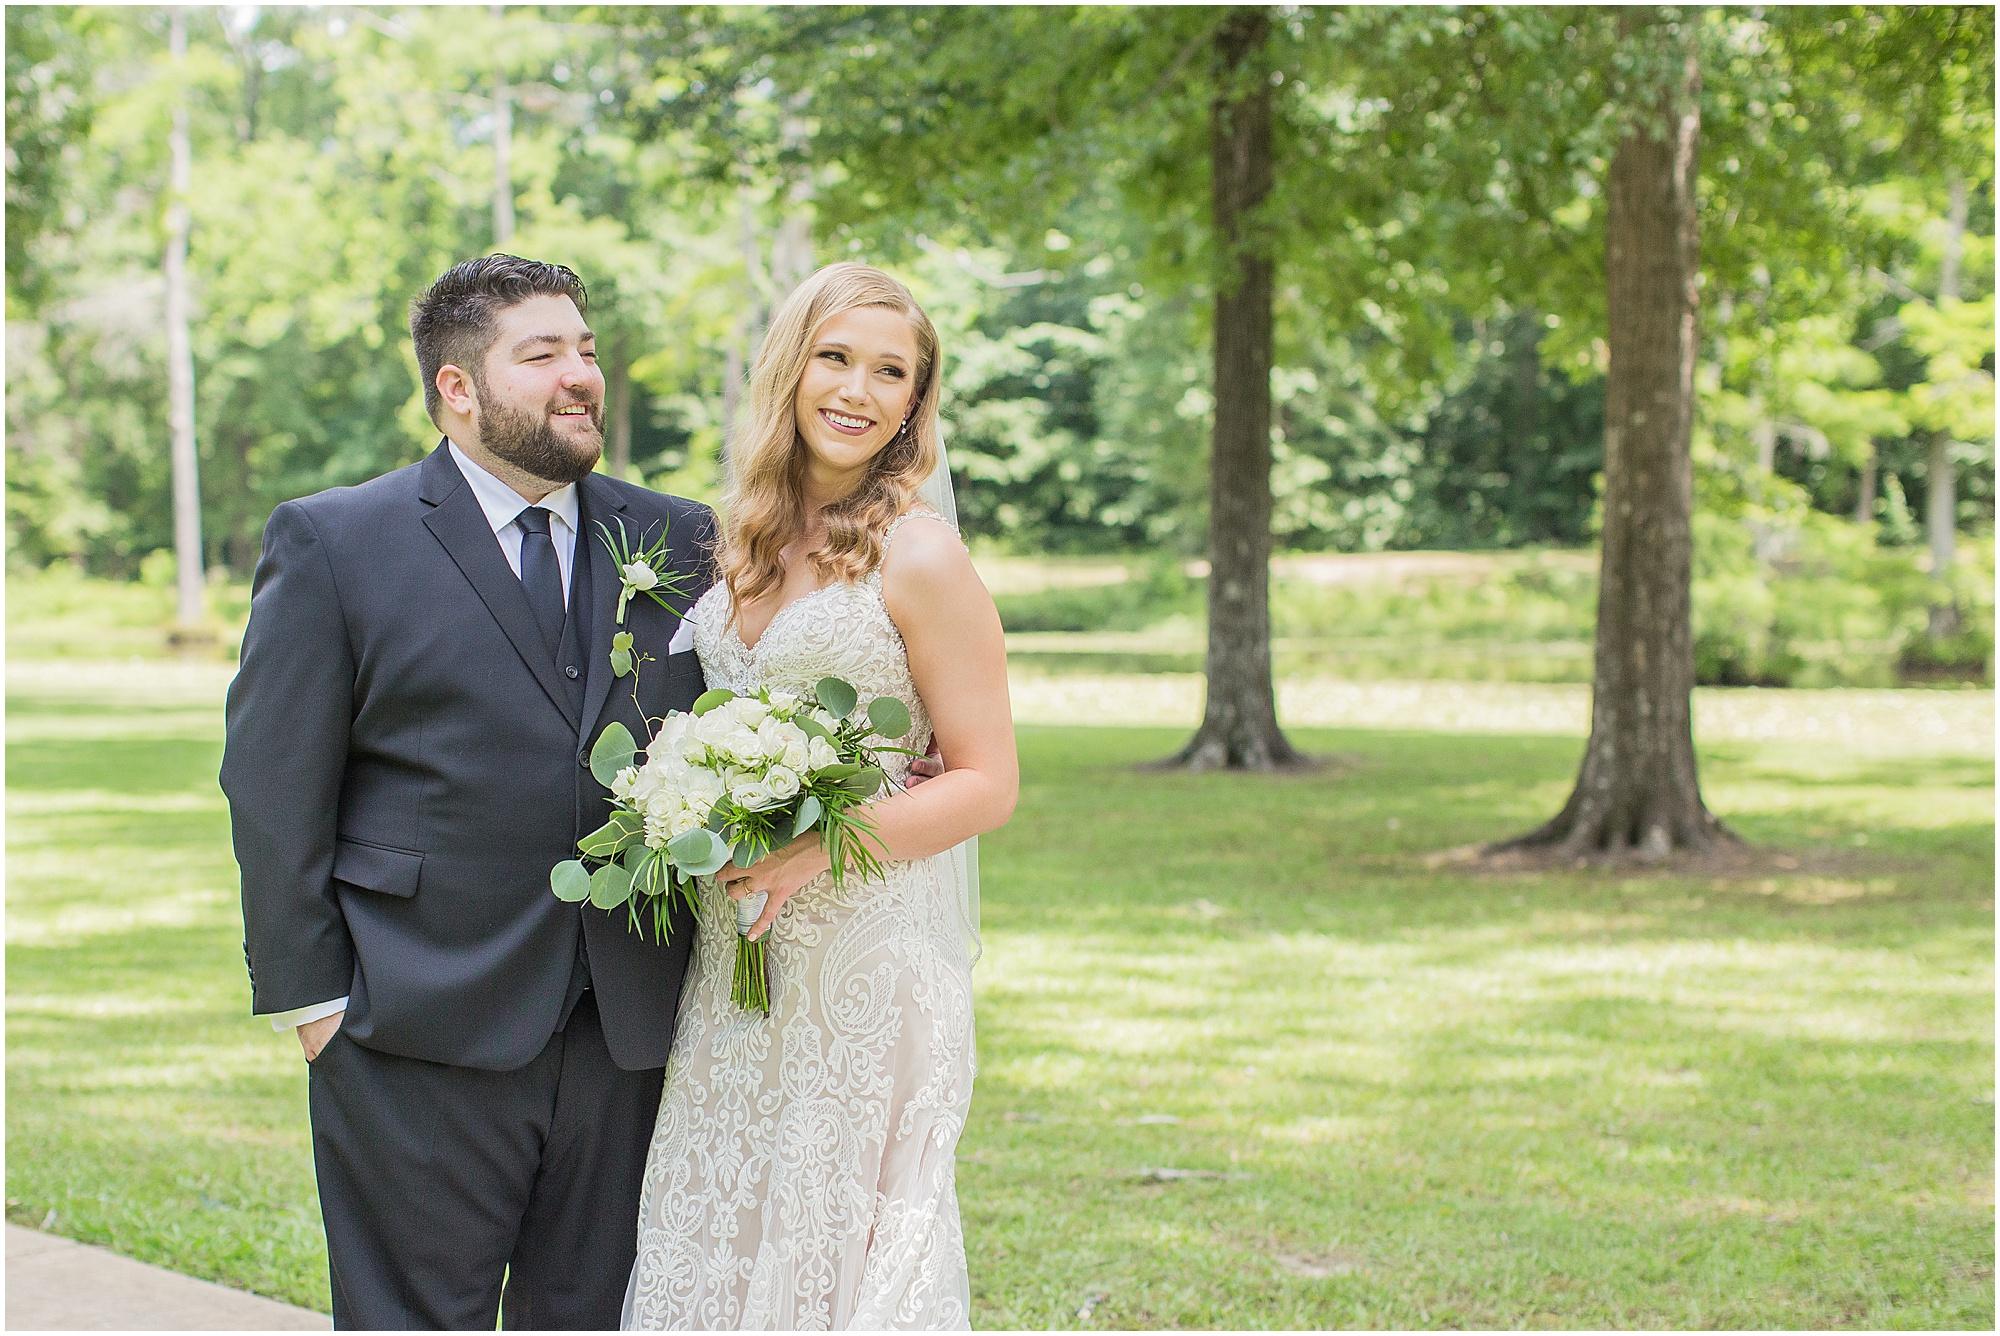 mississippi-summer-wedding-mcclain-lodge_0015.jpg